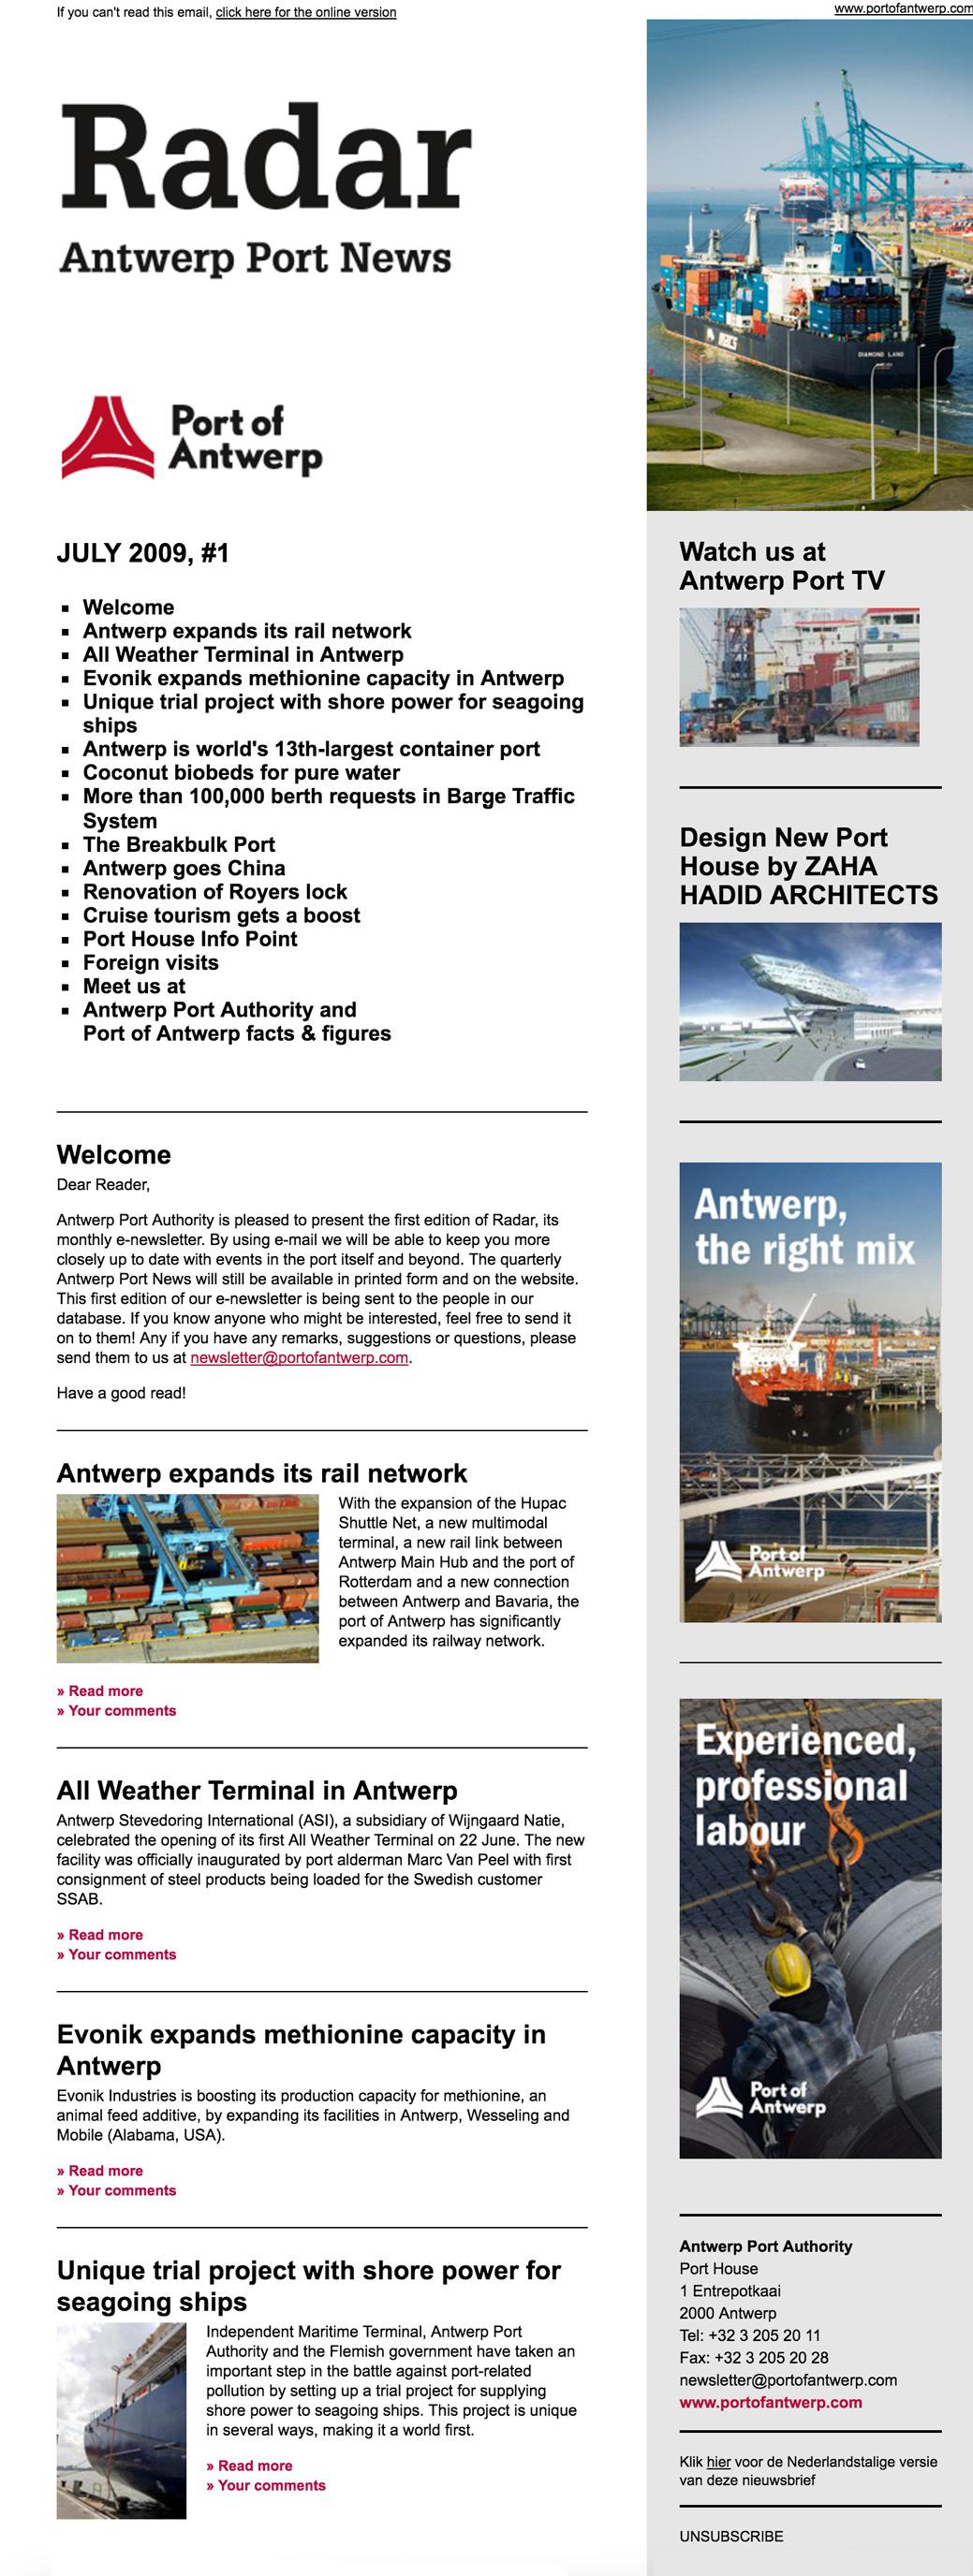 Port of Antwerp - Projects - Rekall - Webdesign